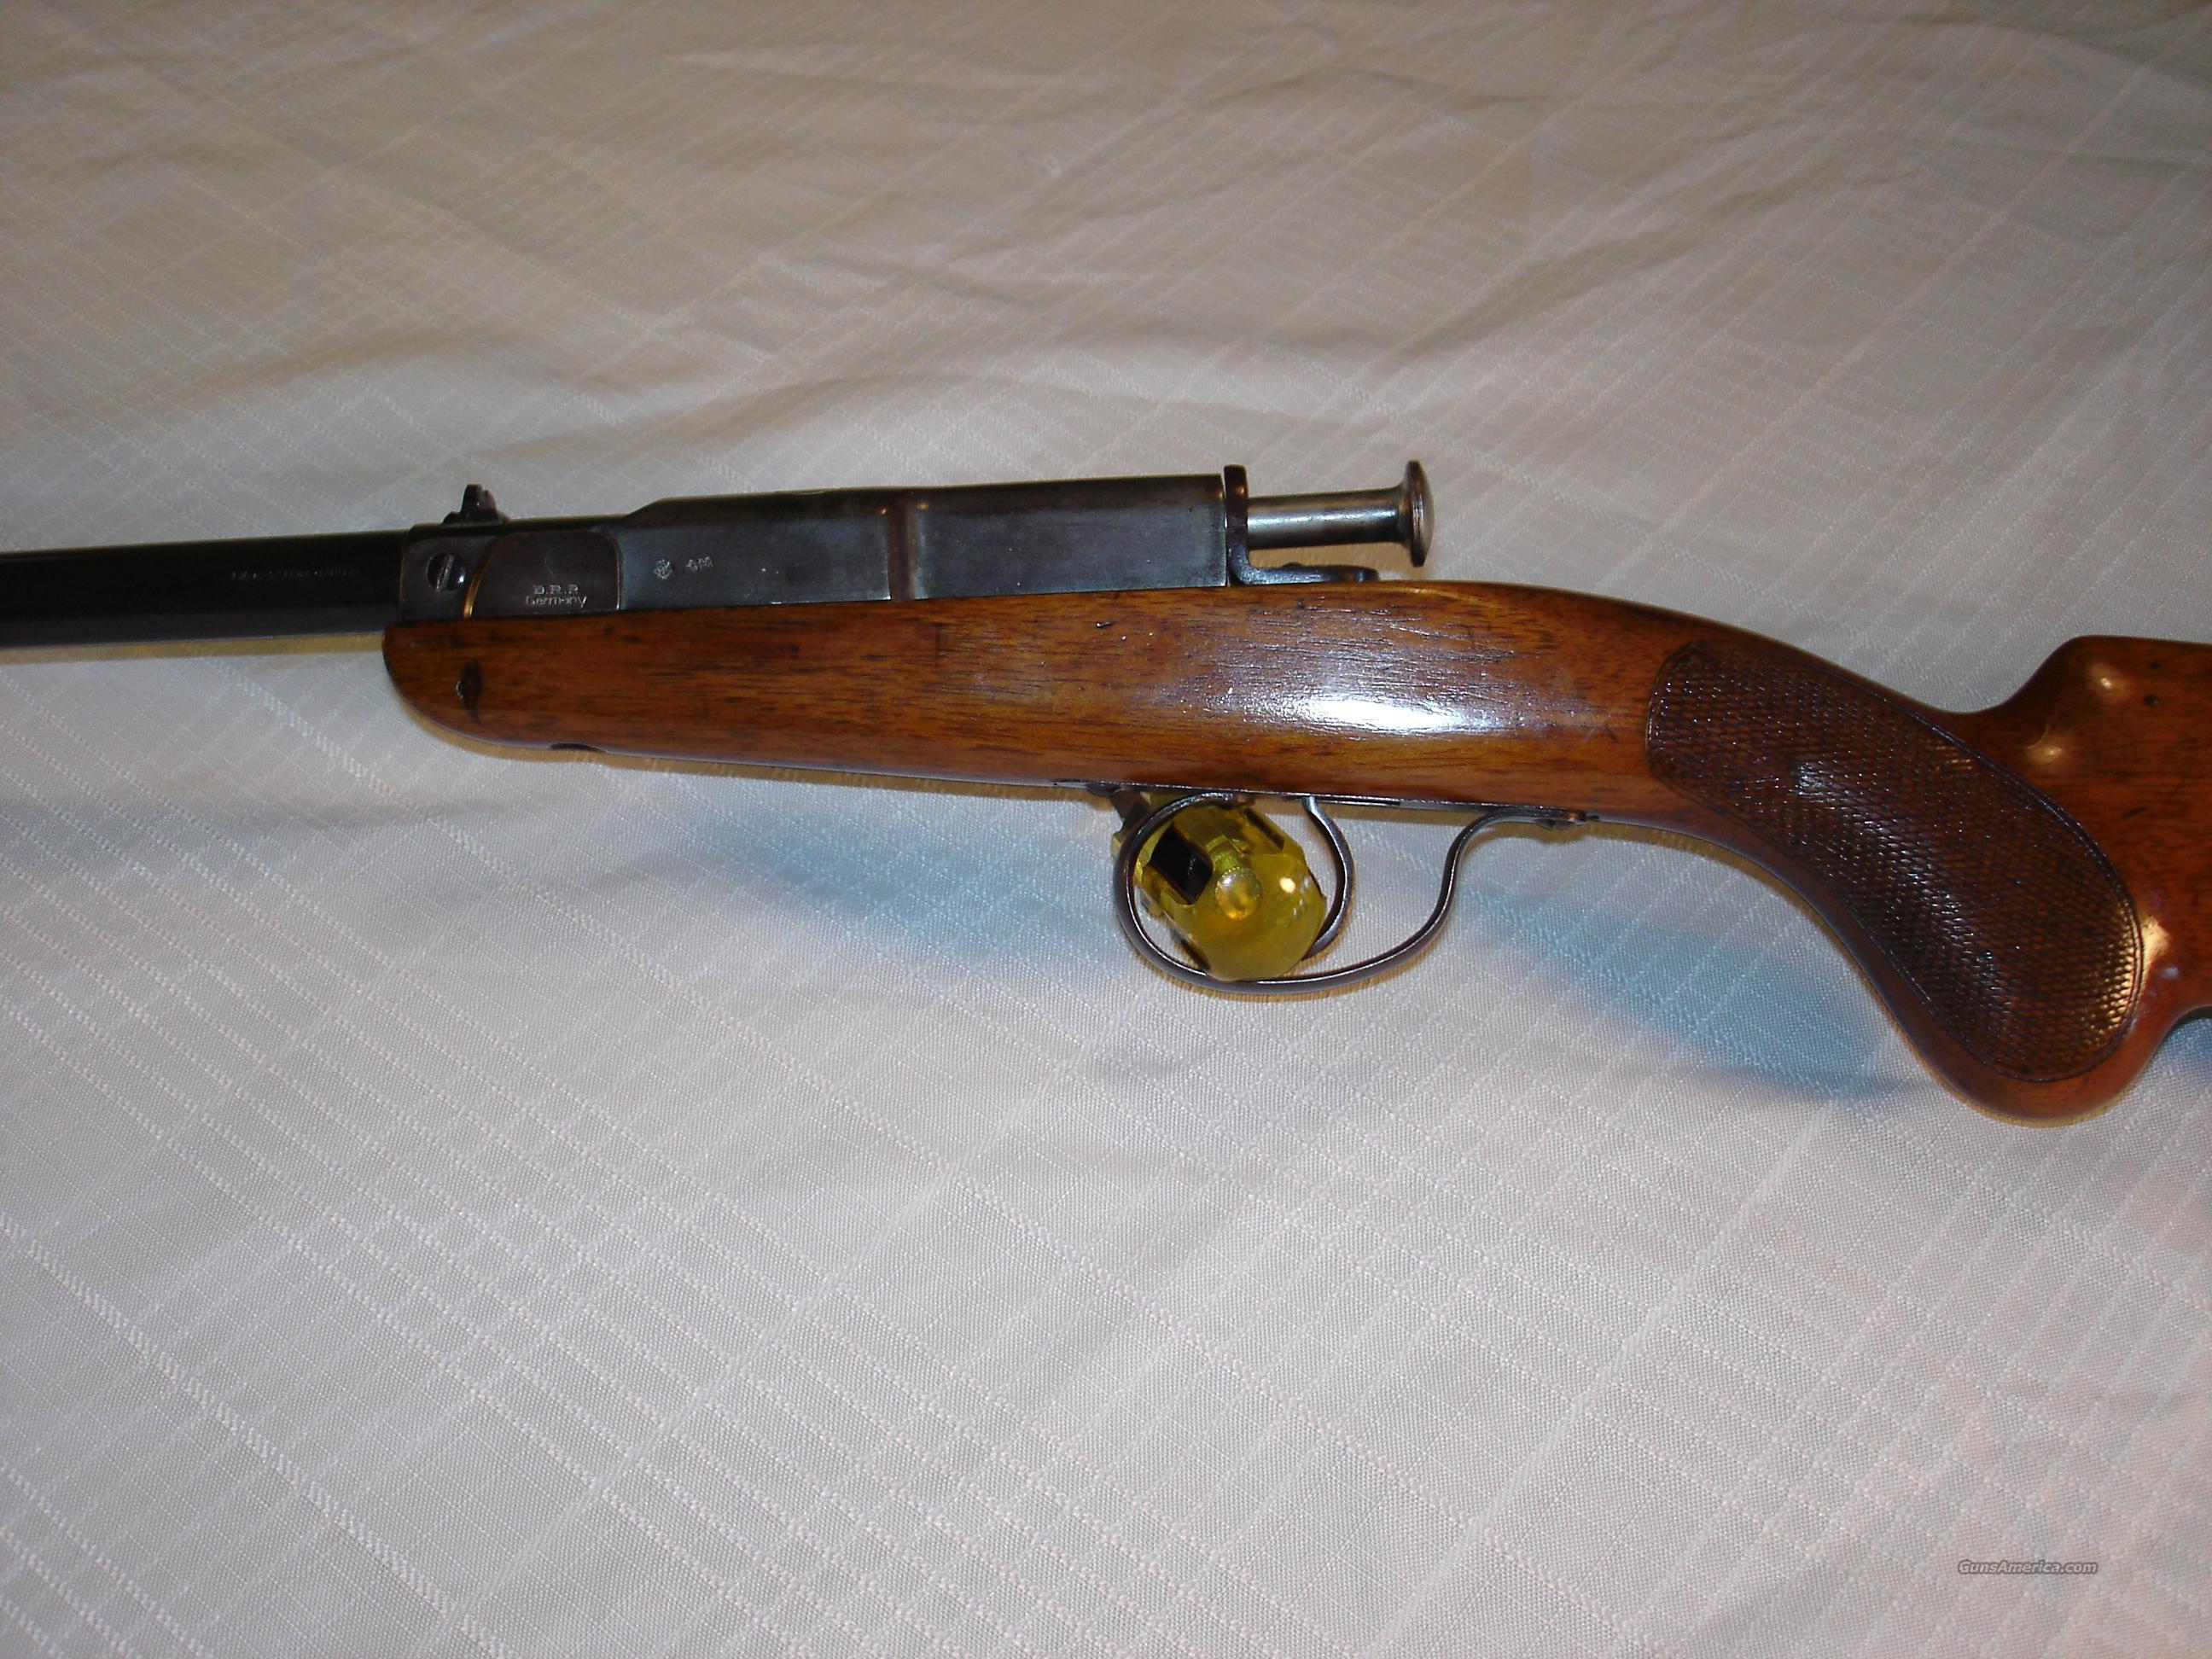 Deutsche werke model 1 german 22 lr single shot rifle